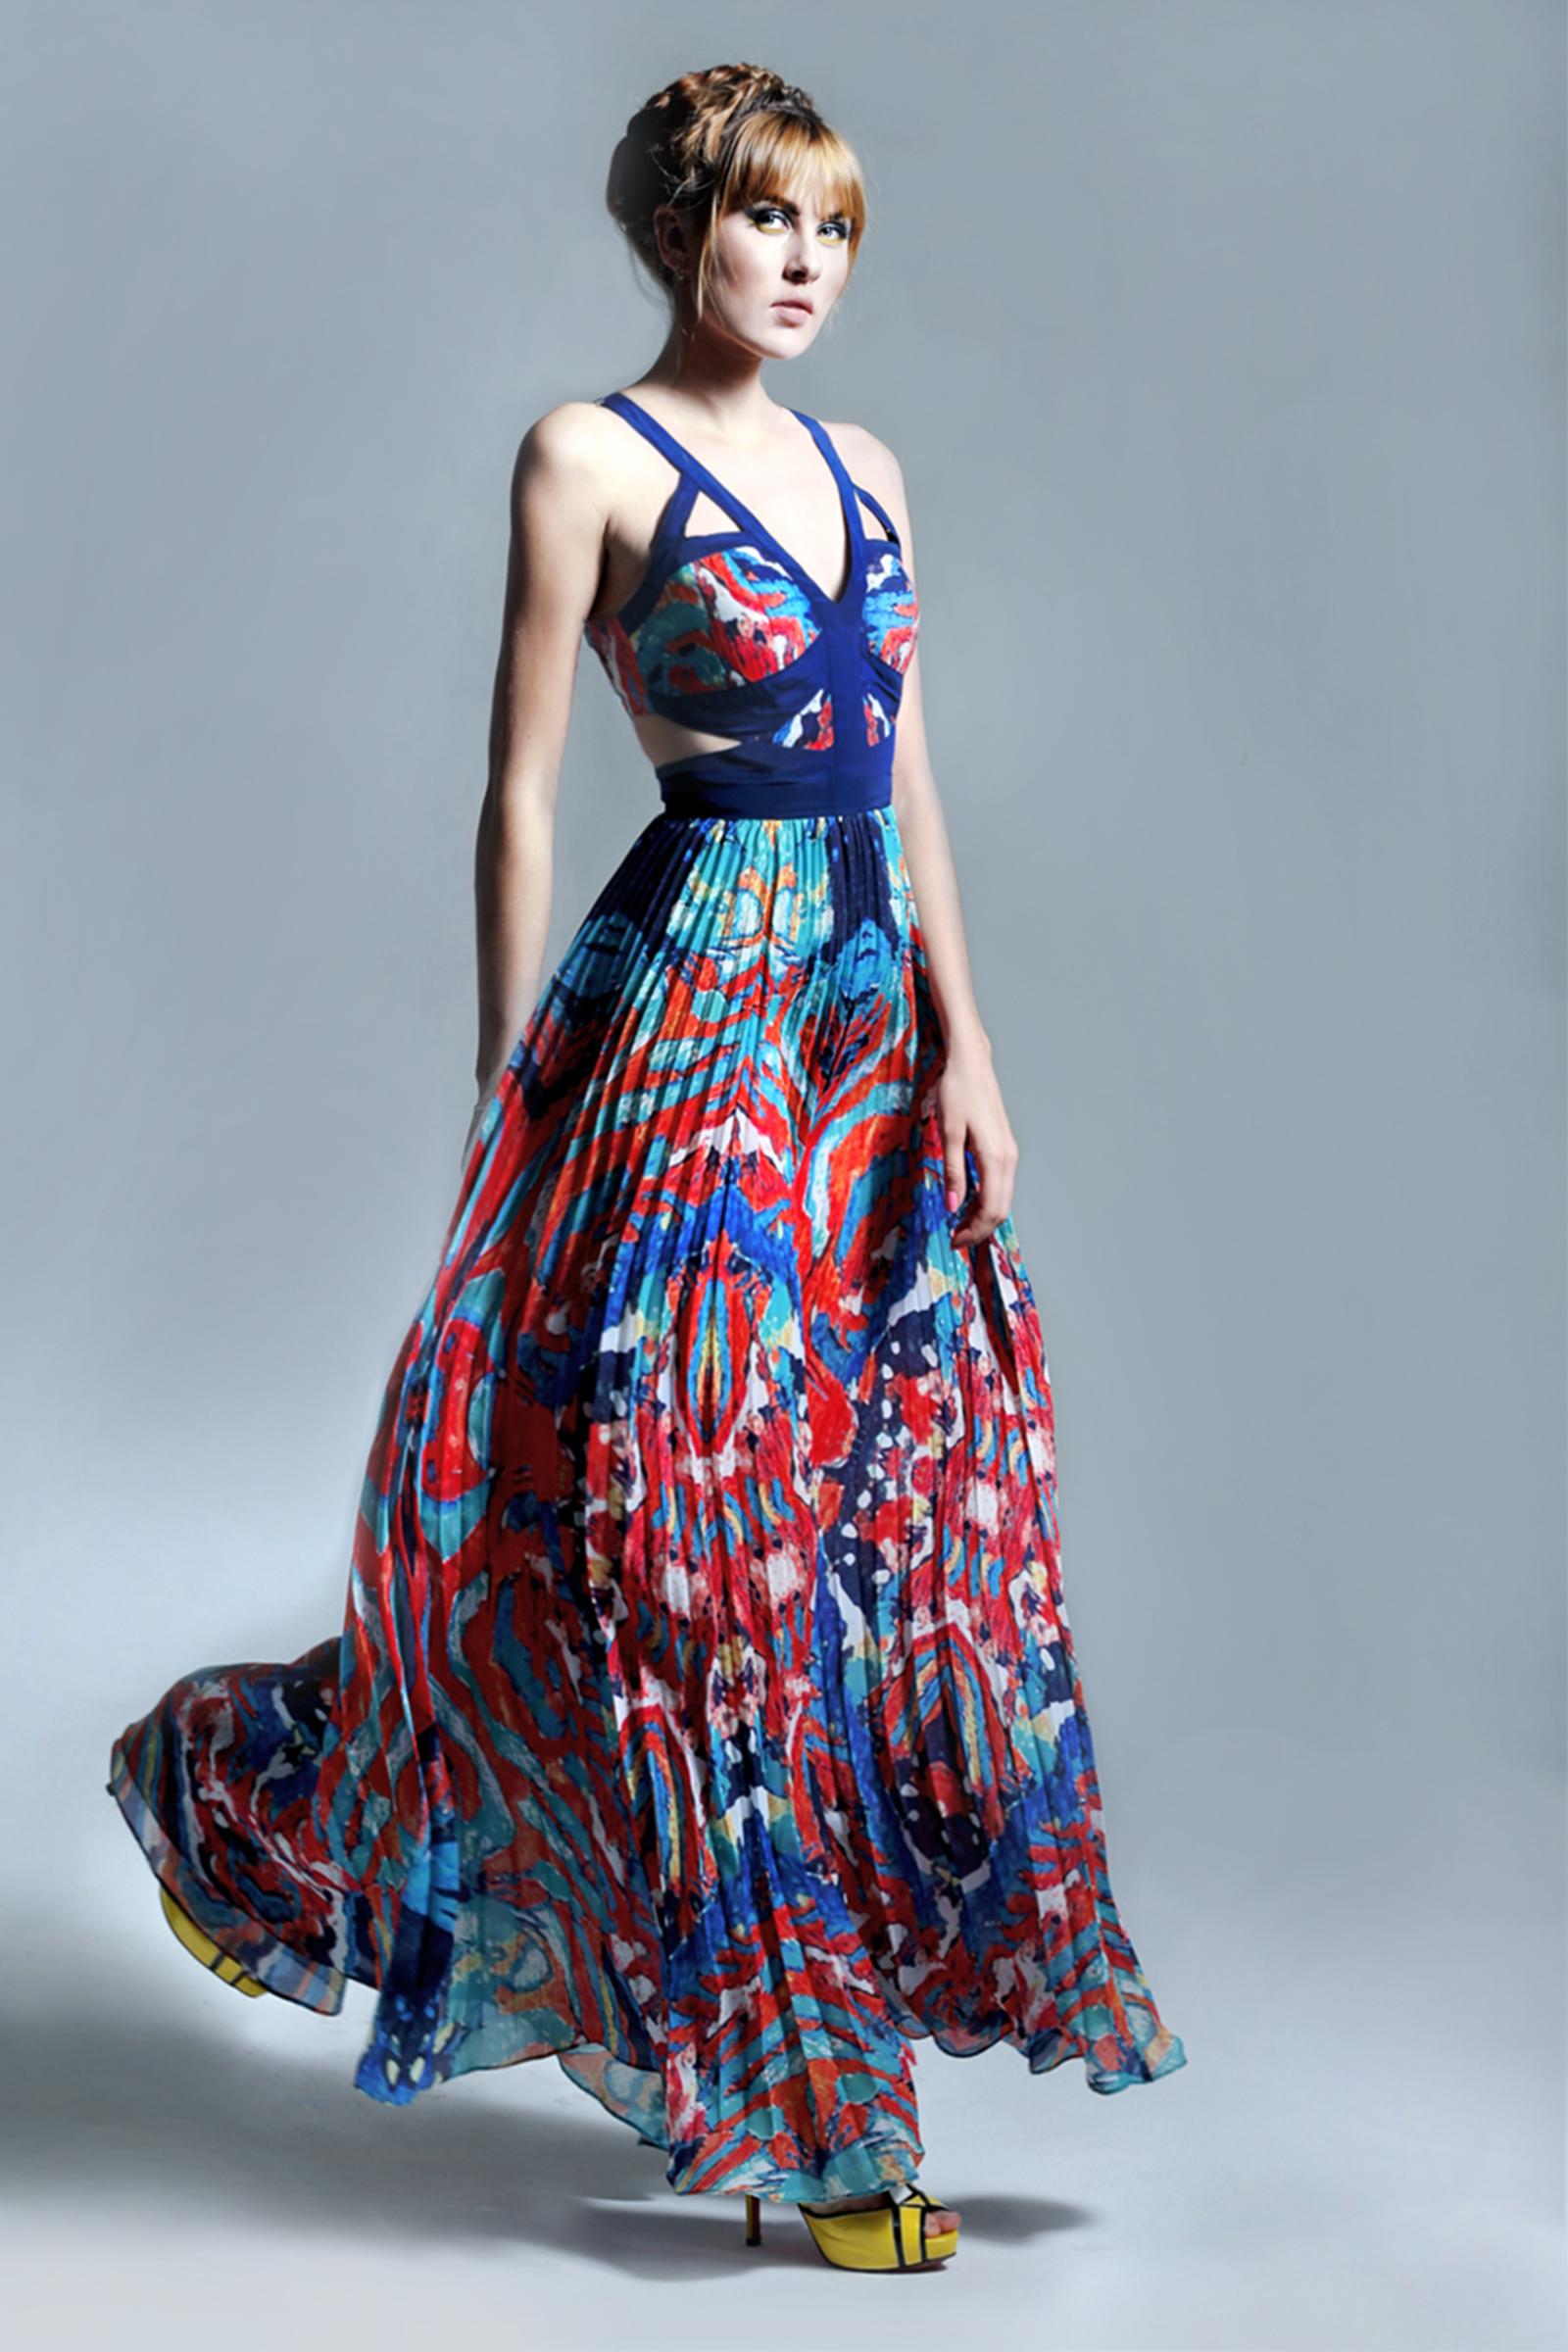 Cutout Maxi Dress - Oceanic Print · kris jane · Online Store ...